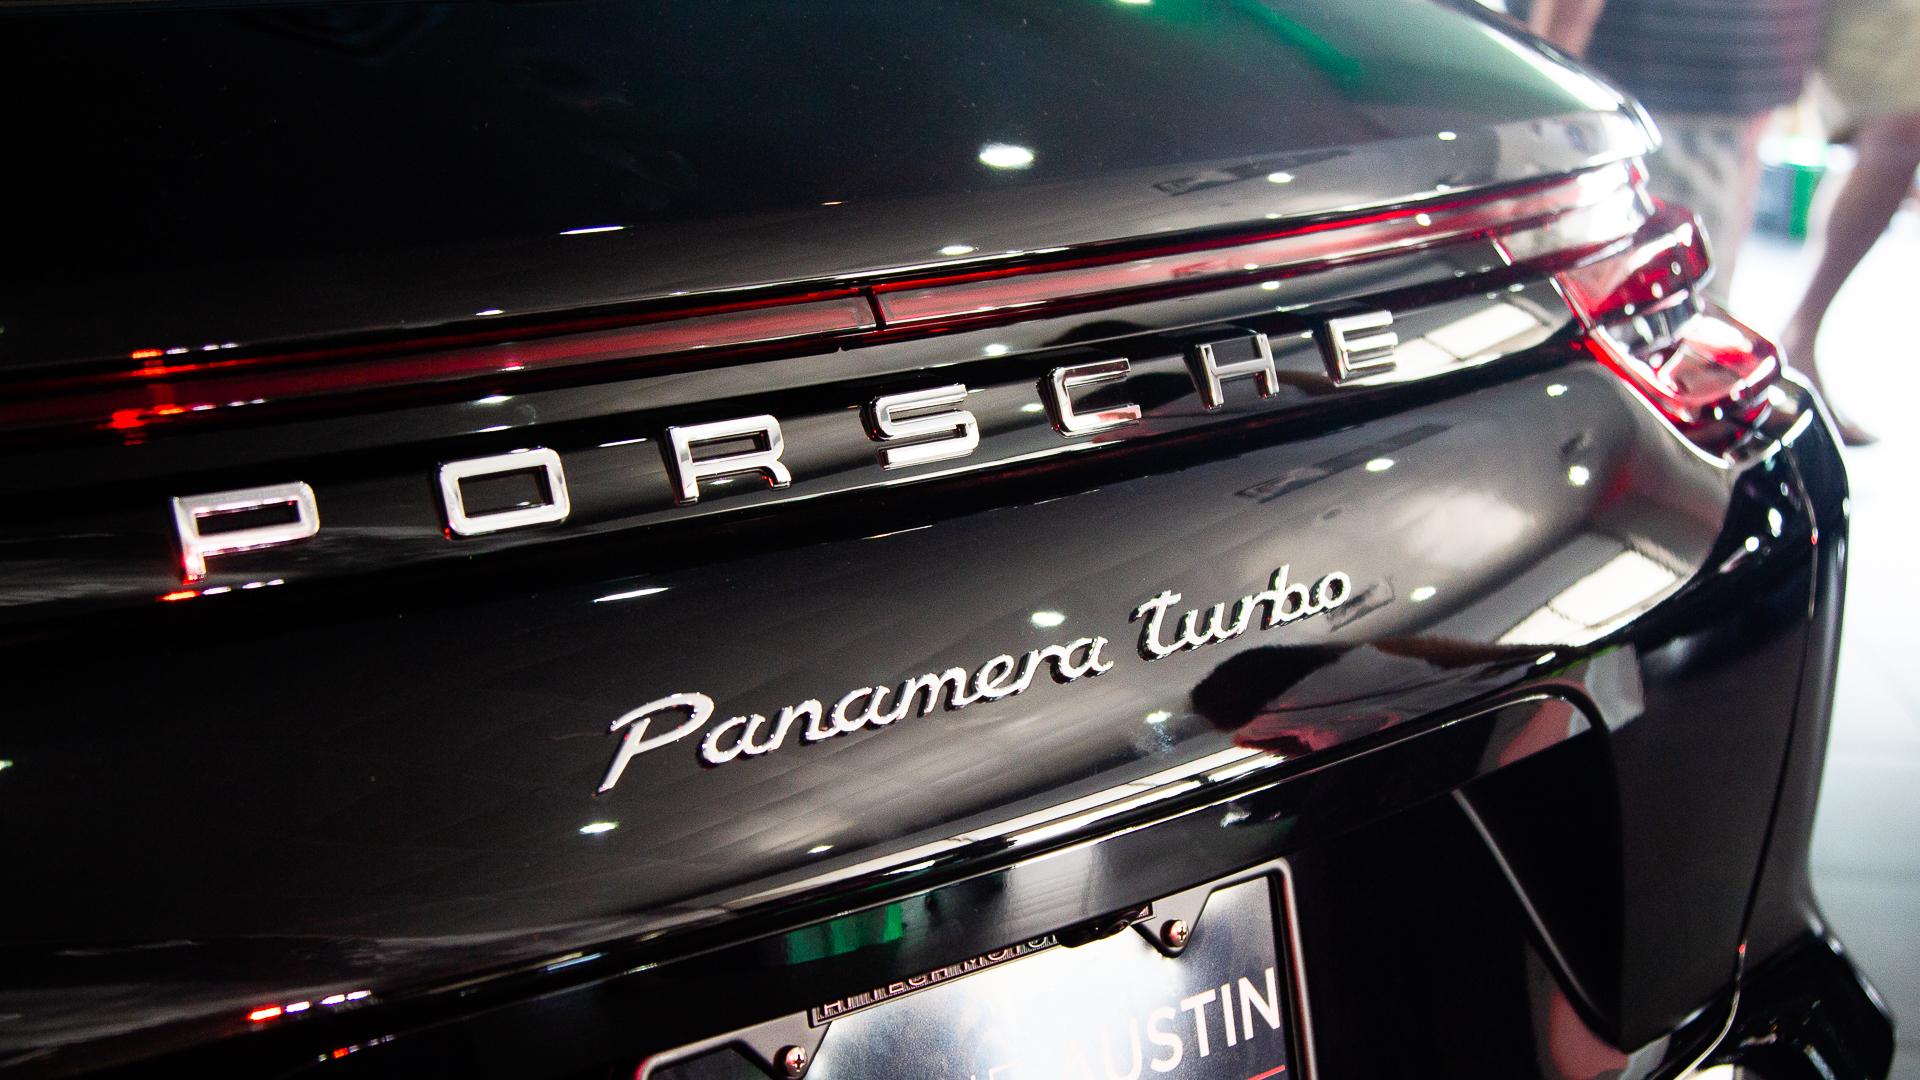 Porsche-Austin-2018-Panamera-15.jpg